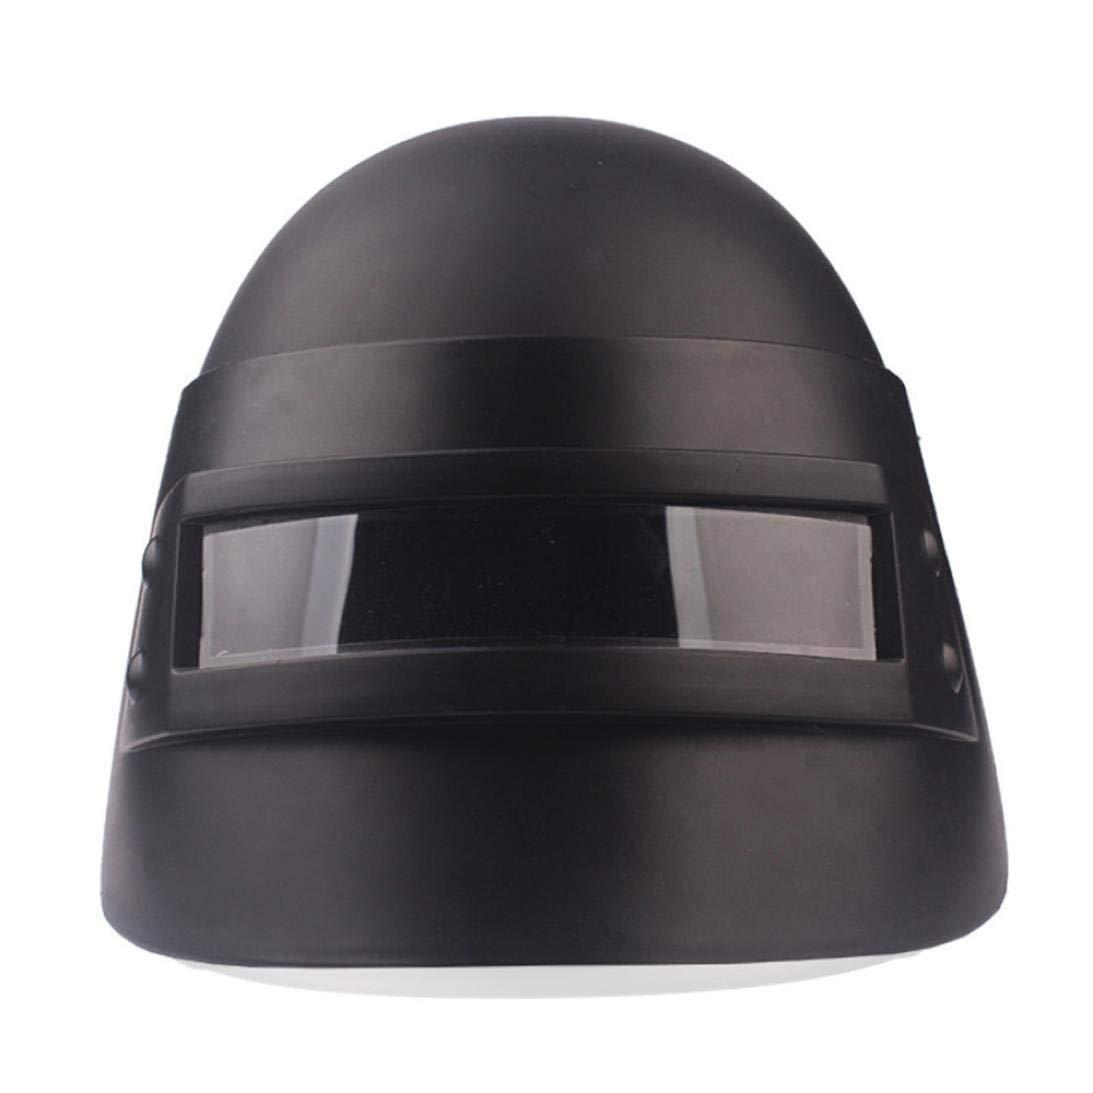 Simulation Battlegrounds Level 3 Helmet Cap Props(25.5x 19x 16cm),123Loop Game Cosplay Mask Battlegrounds Level 3 Helmet Cap Props by 123Loop (Image #7)